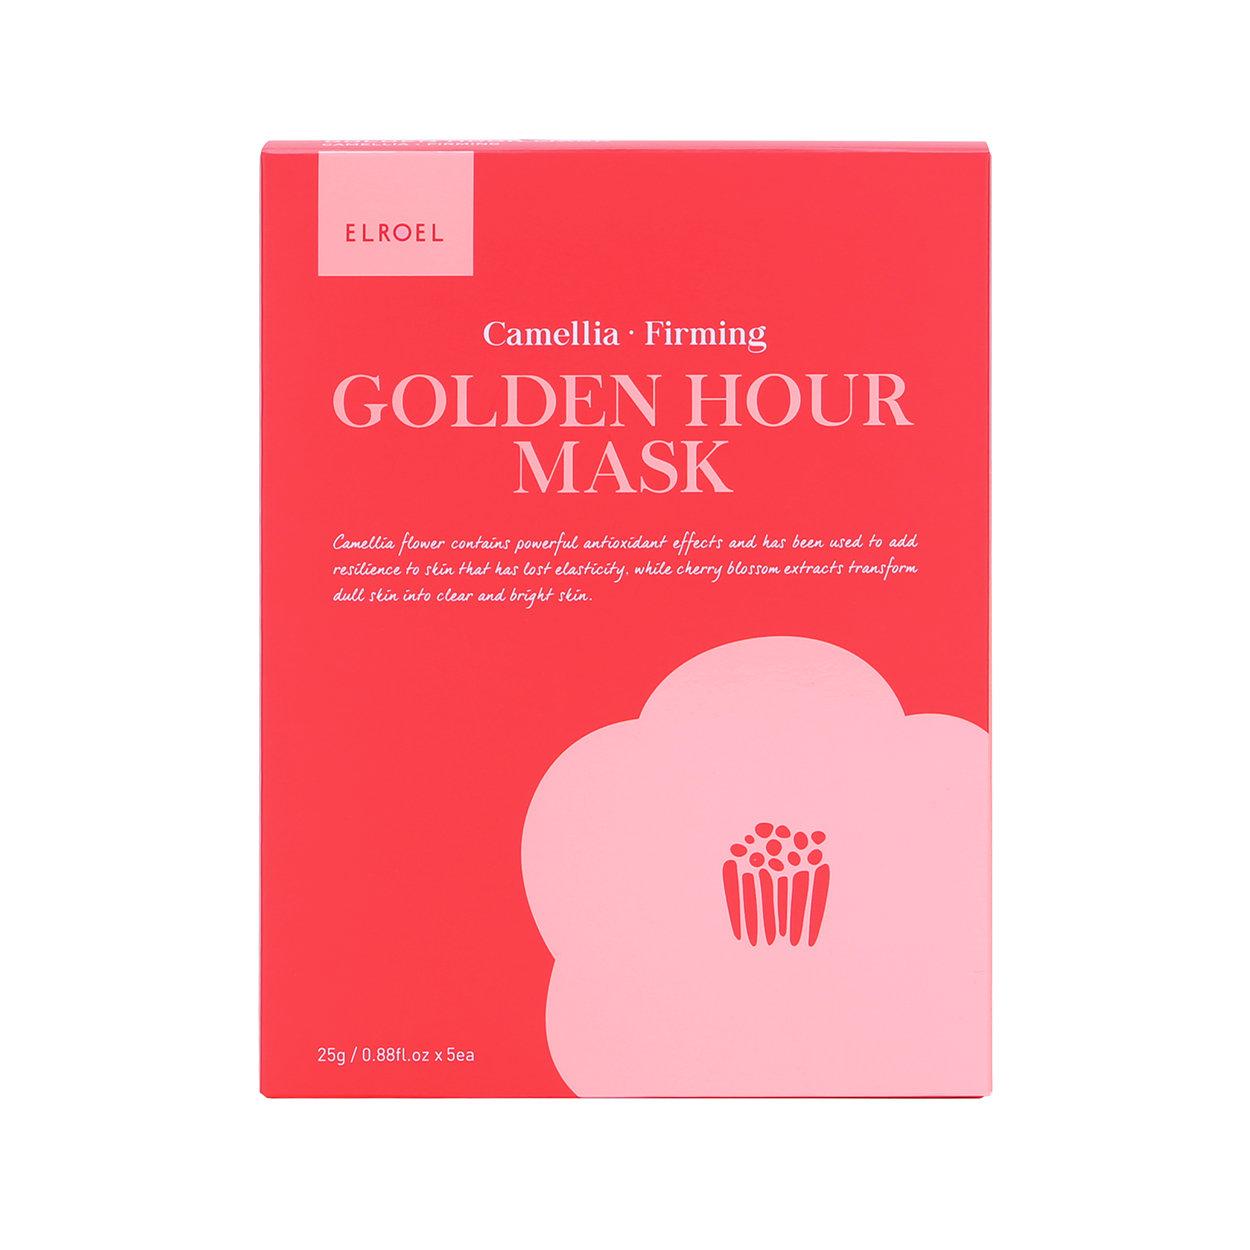 Image of 5 Maschere Monouso Golden Hour - Camellia